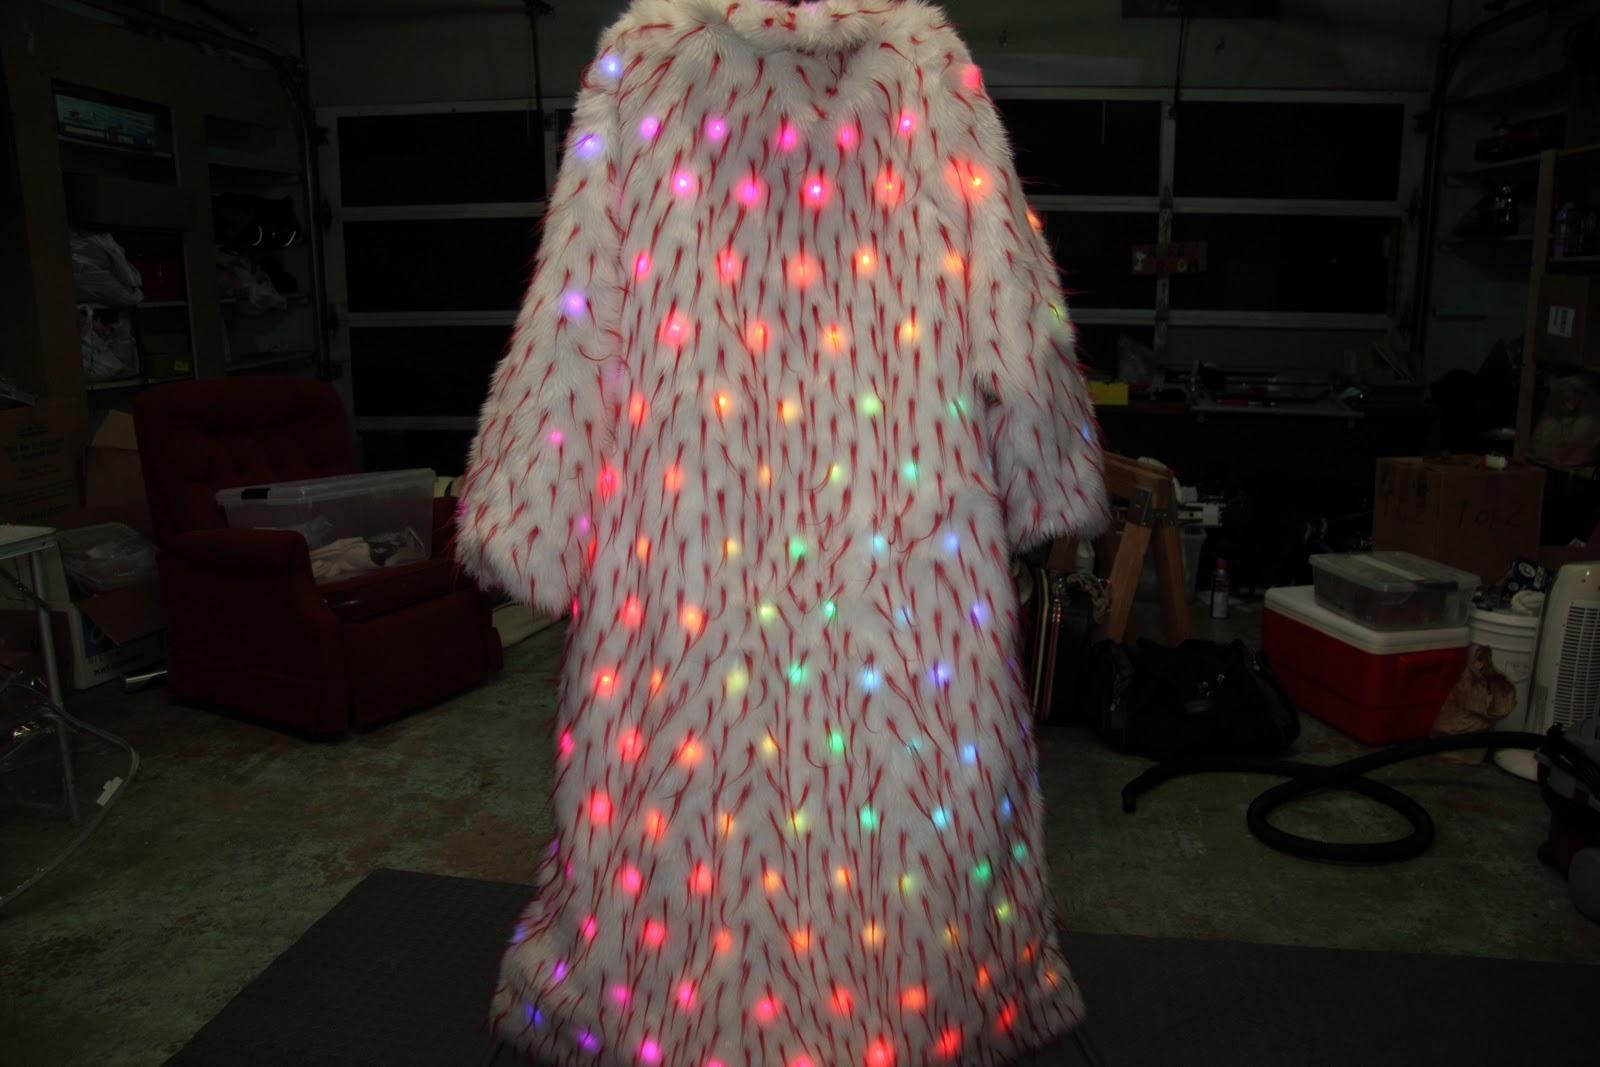 The Amazing Technicolor LED Fur Coat